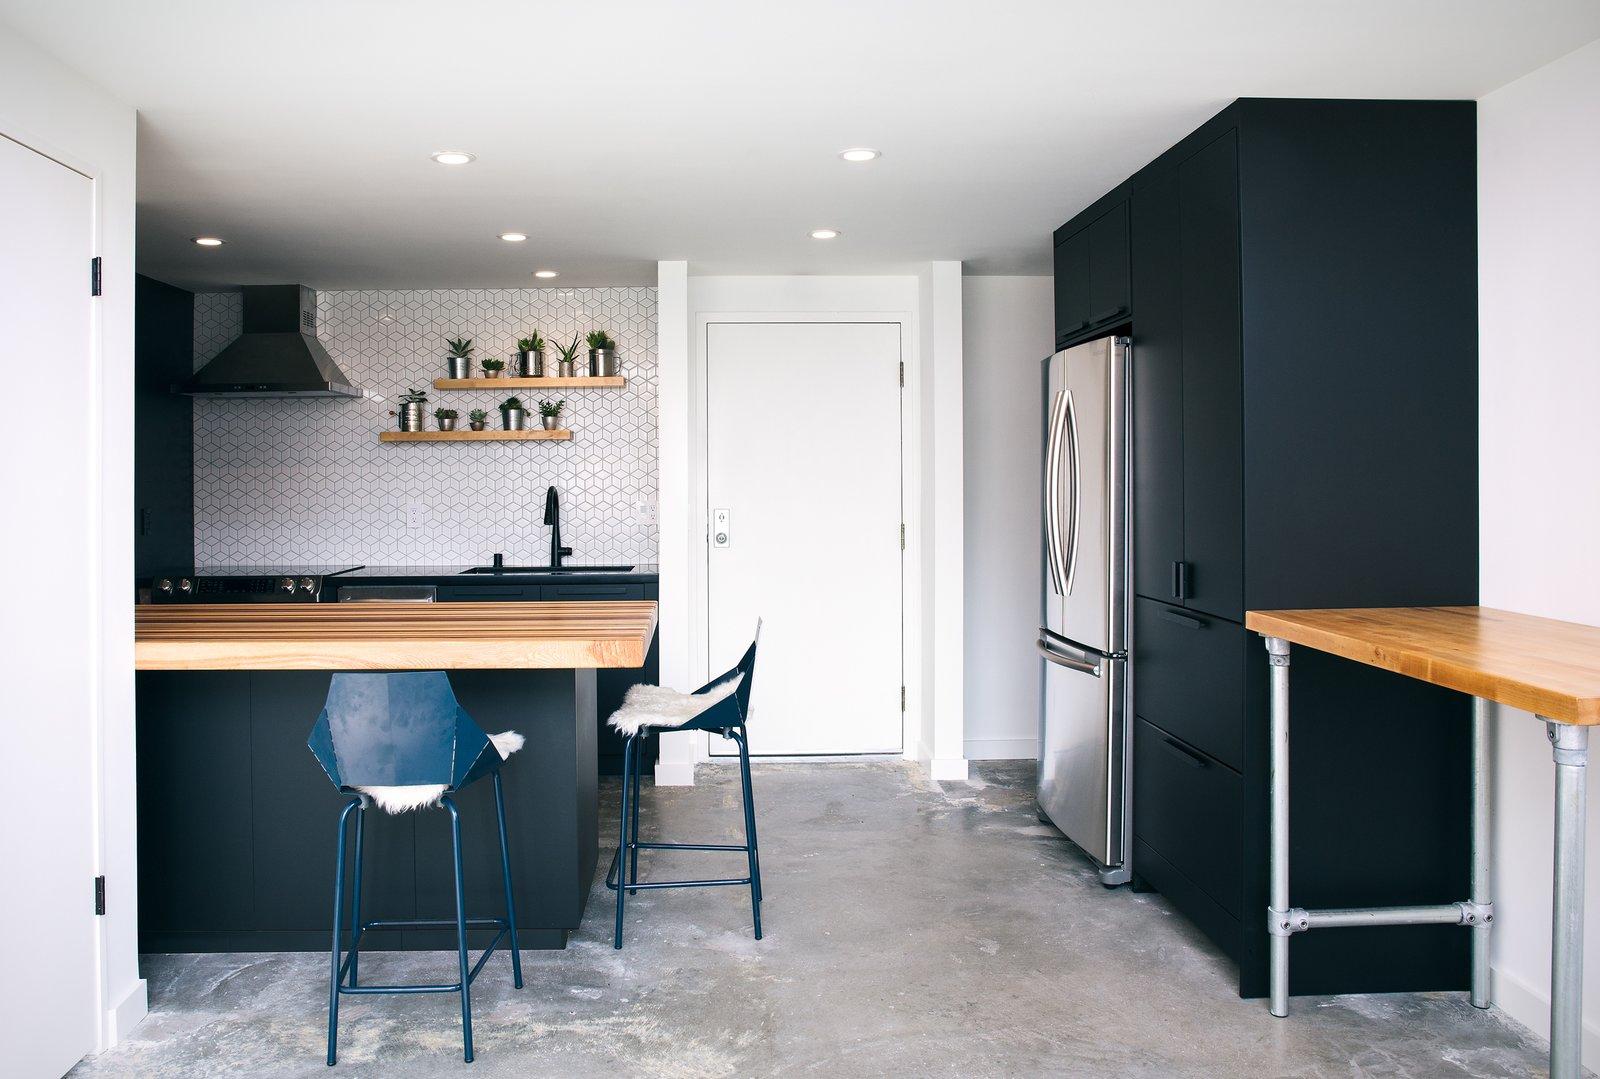 Mission Loft kitchen after